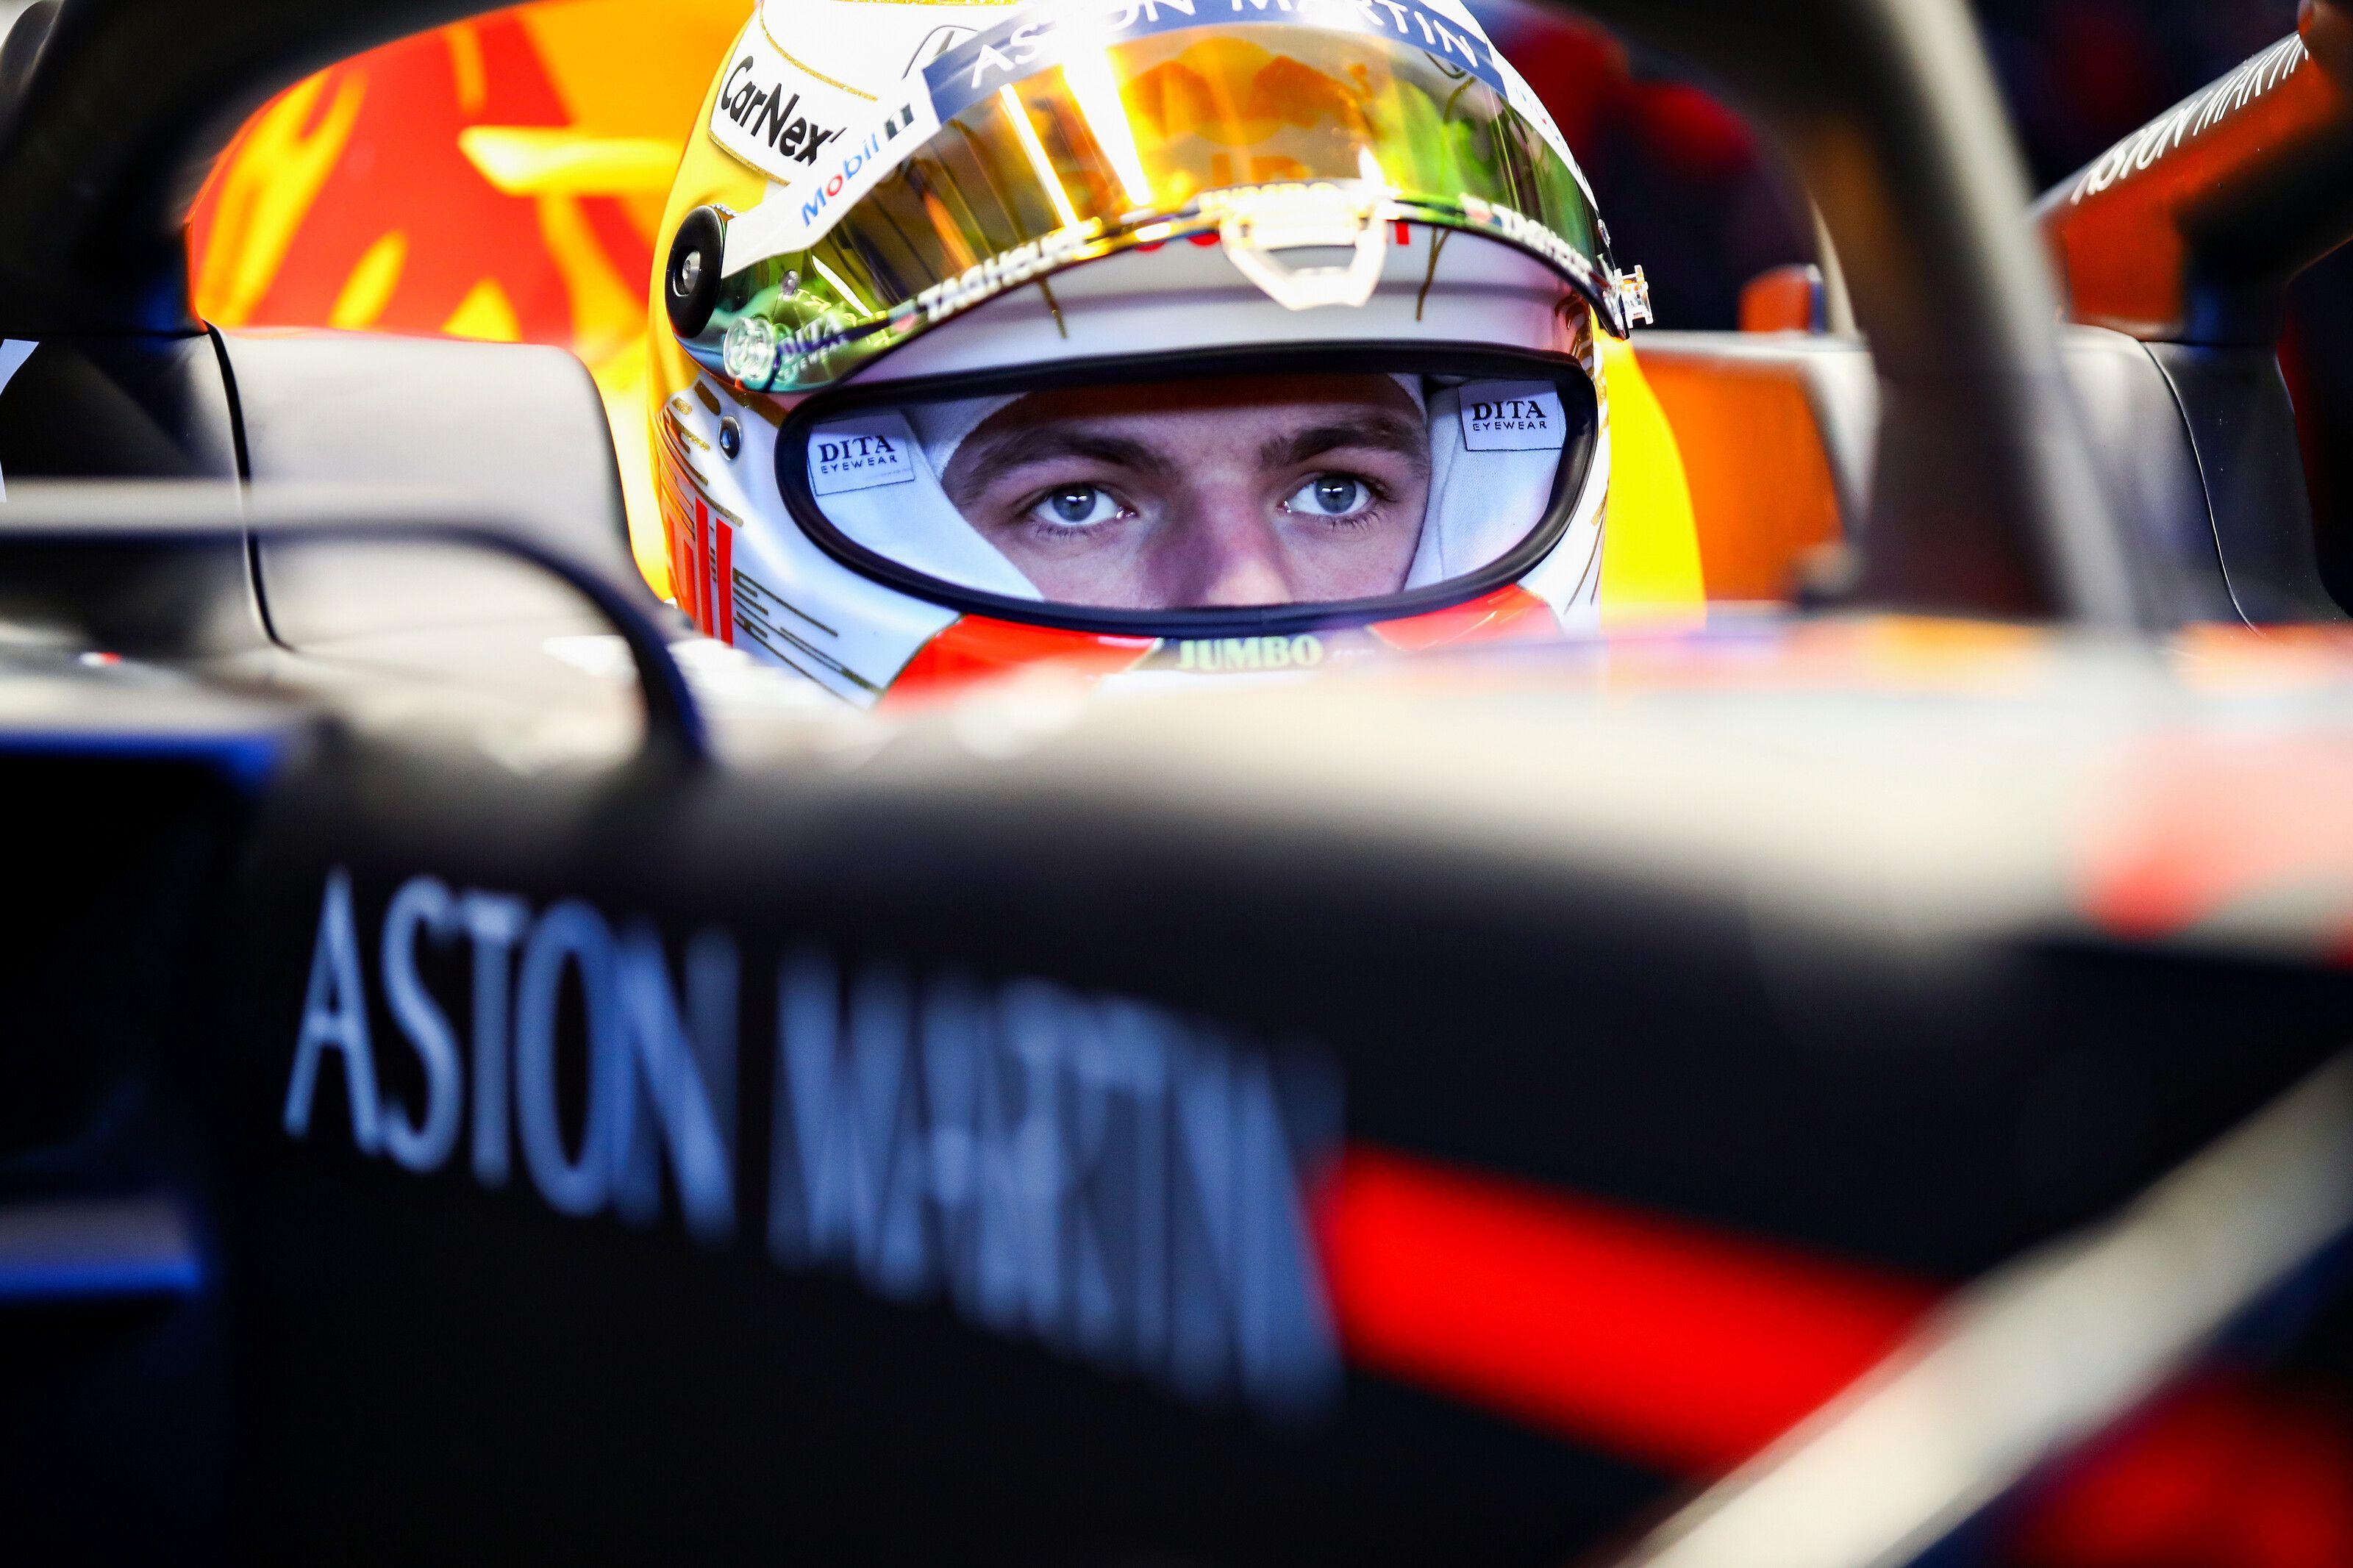 Max Verstappen, F1